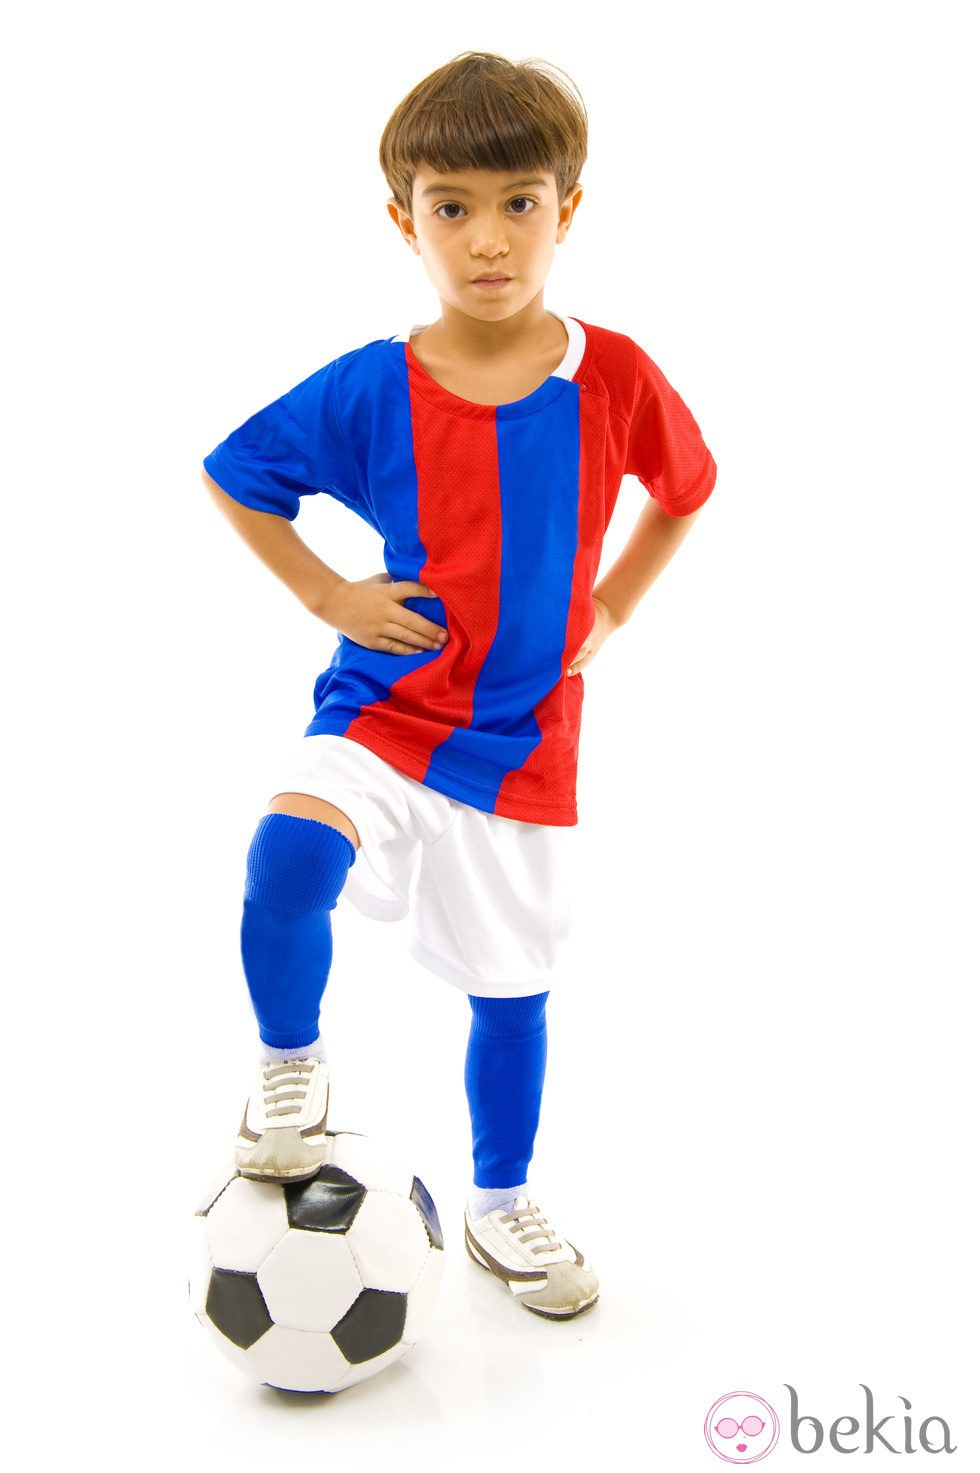 anterior disfraz de futbolista para halloween